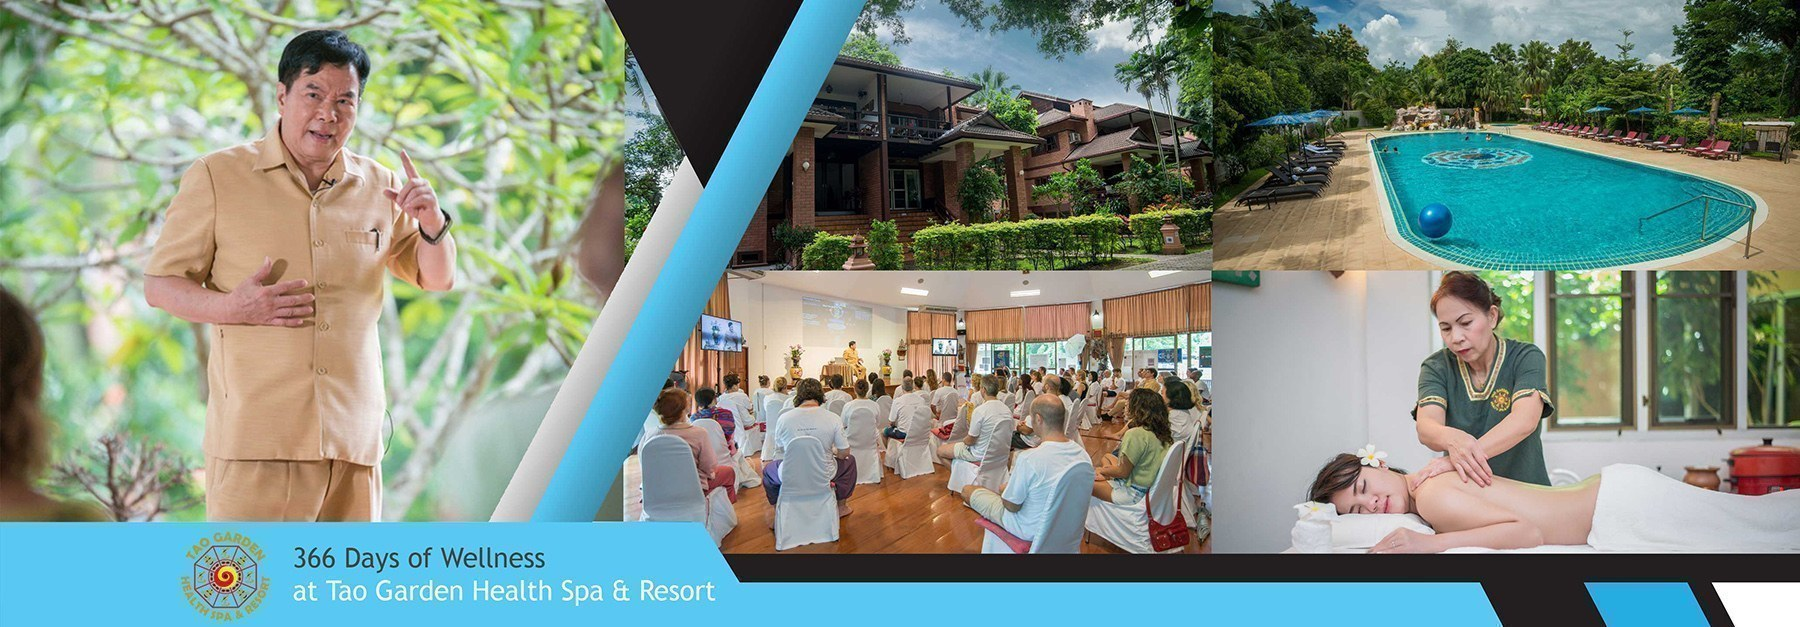 Tao Garden – 366 Days of Wellness at Tao Garden Health Spa & Resort